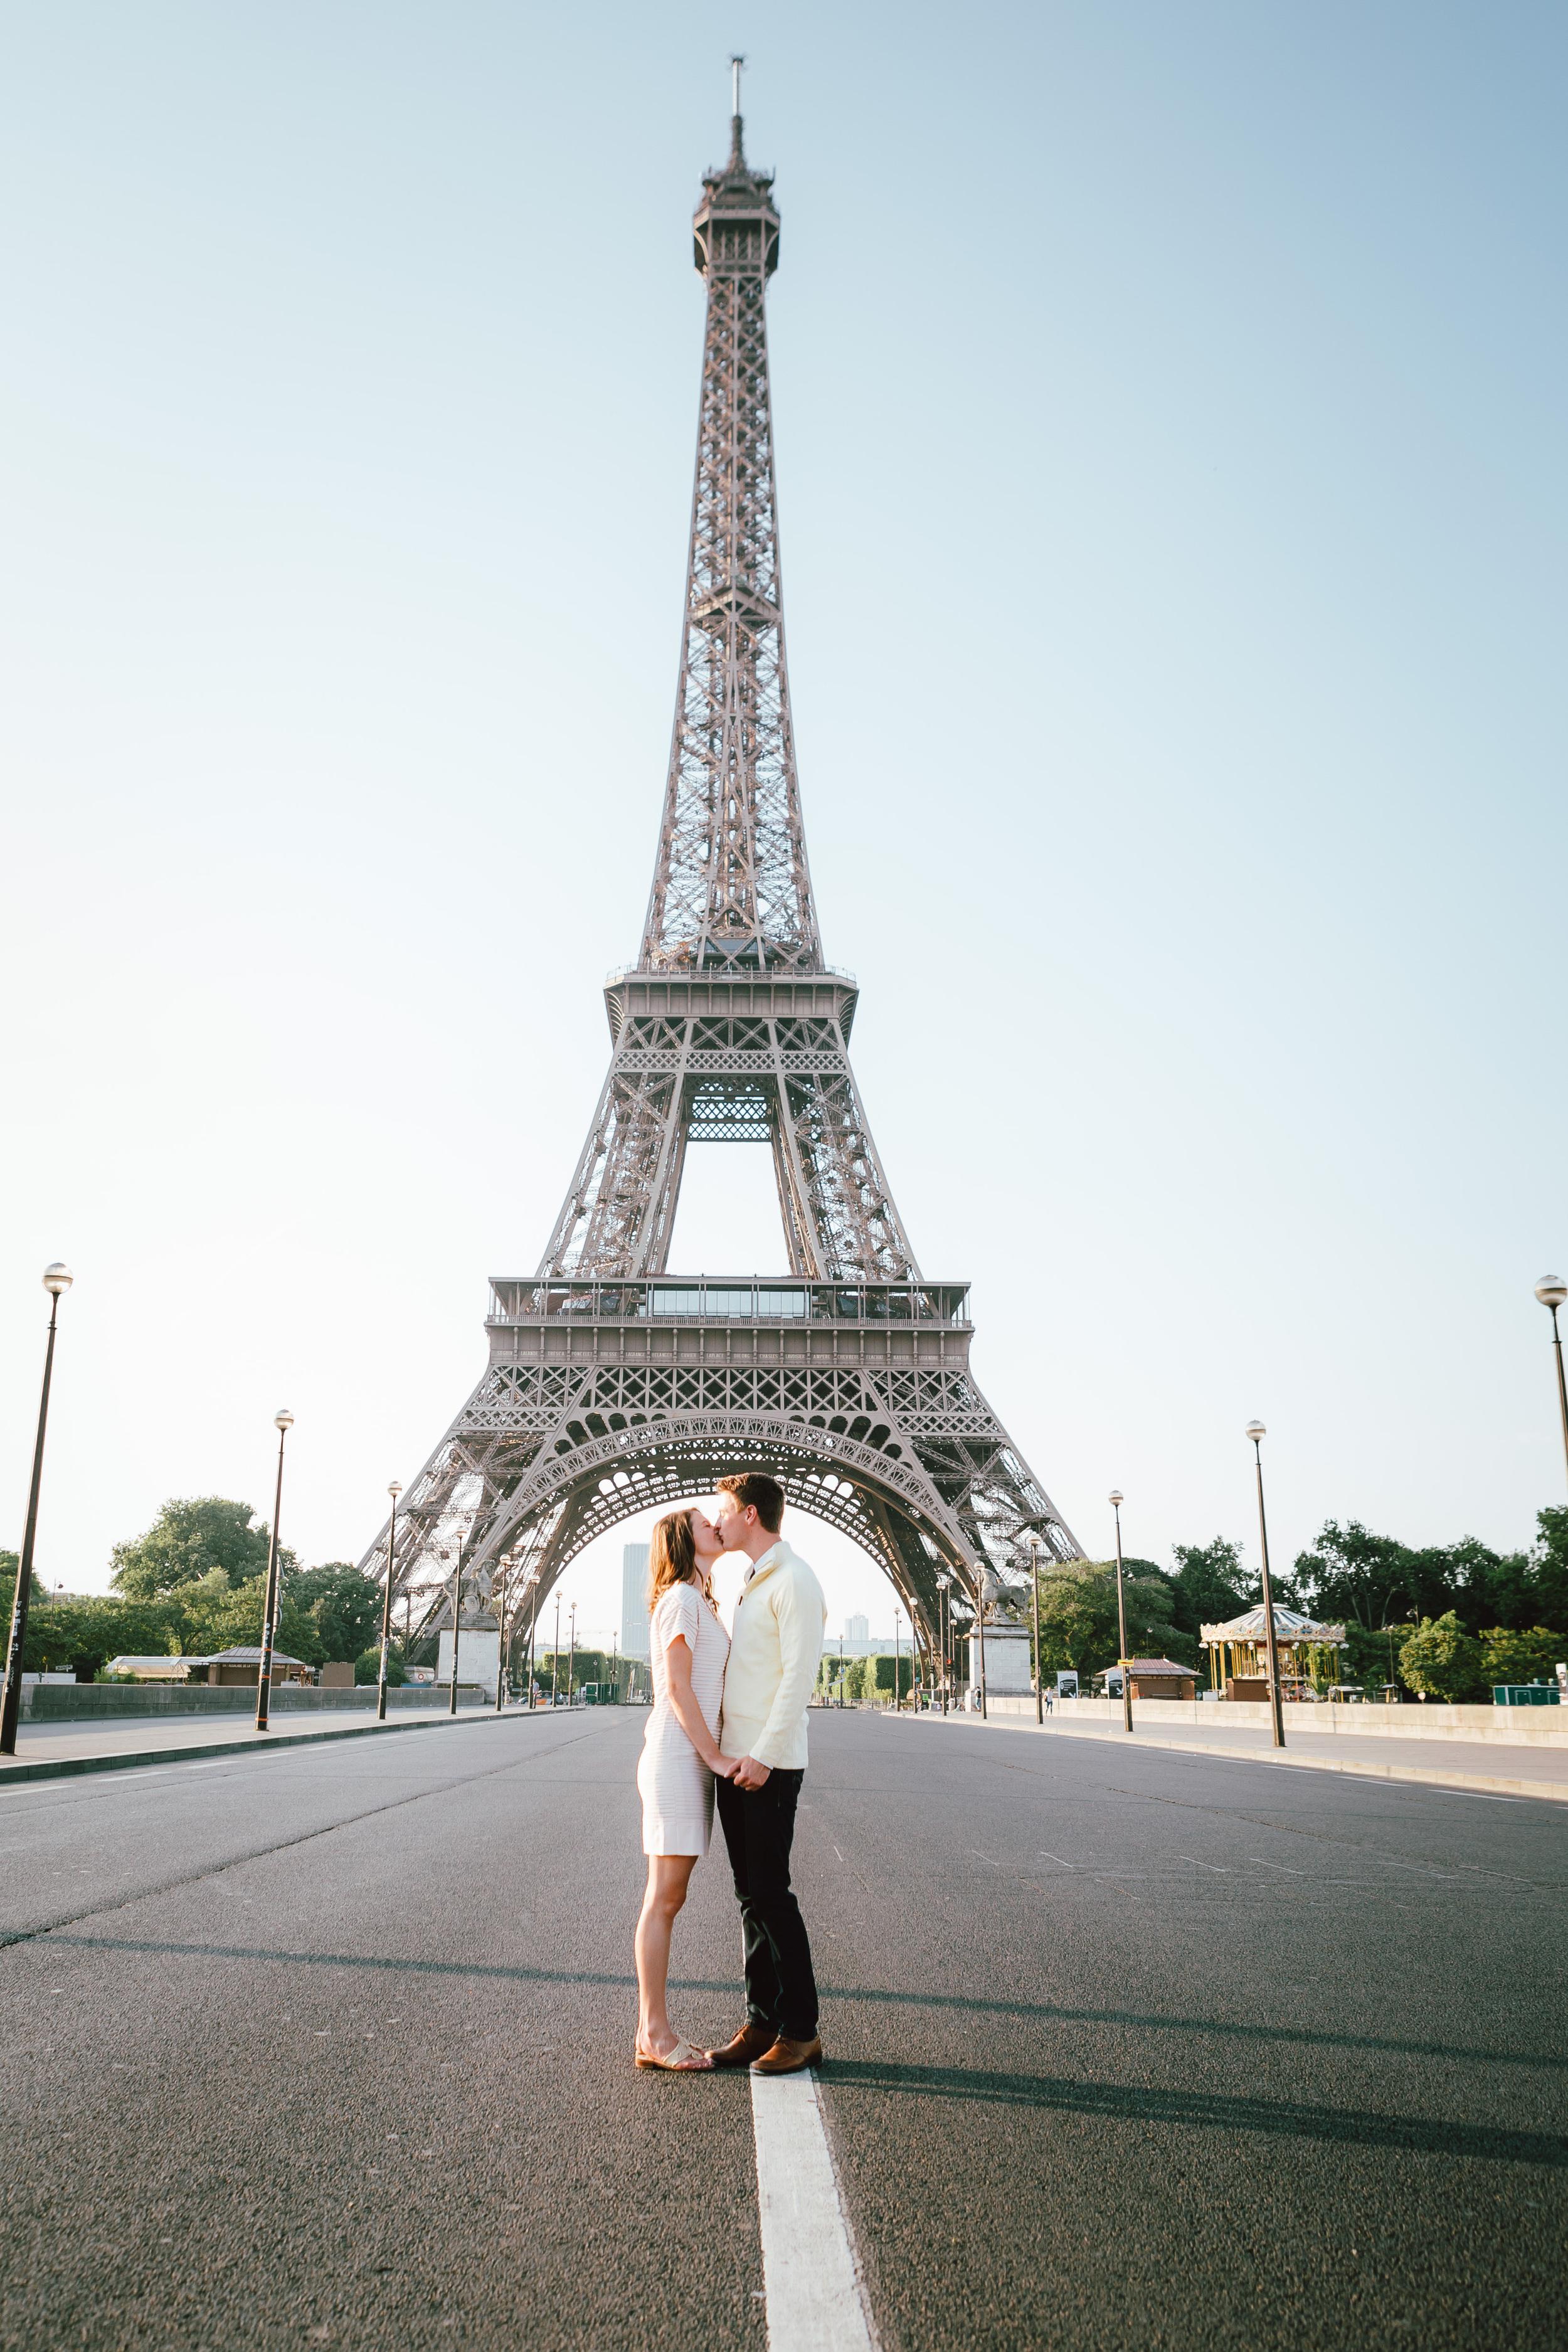 paris photographer surprise proposal session for a couple by the eiffel tower